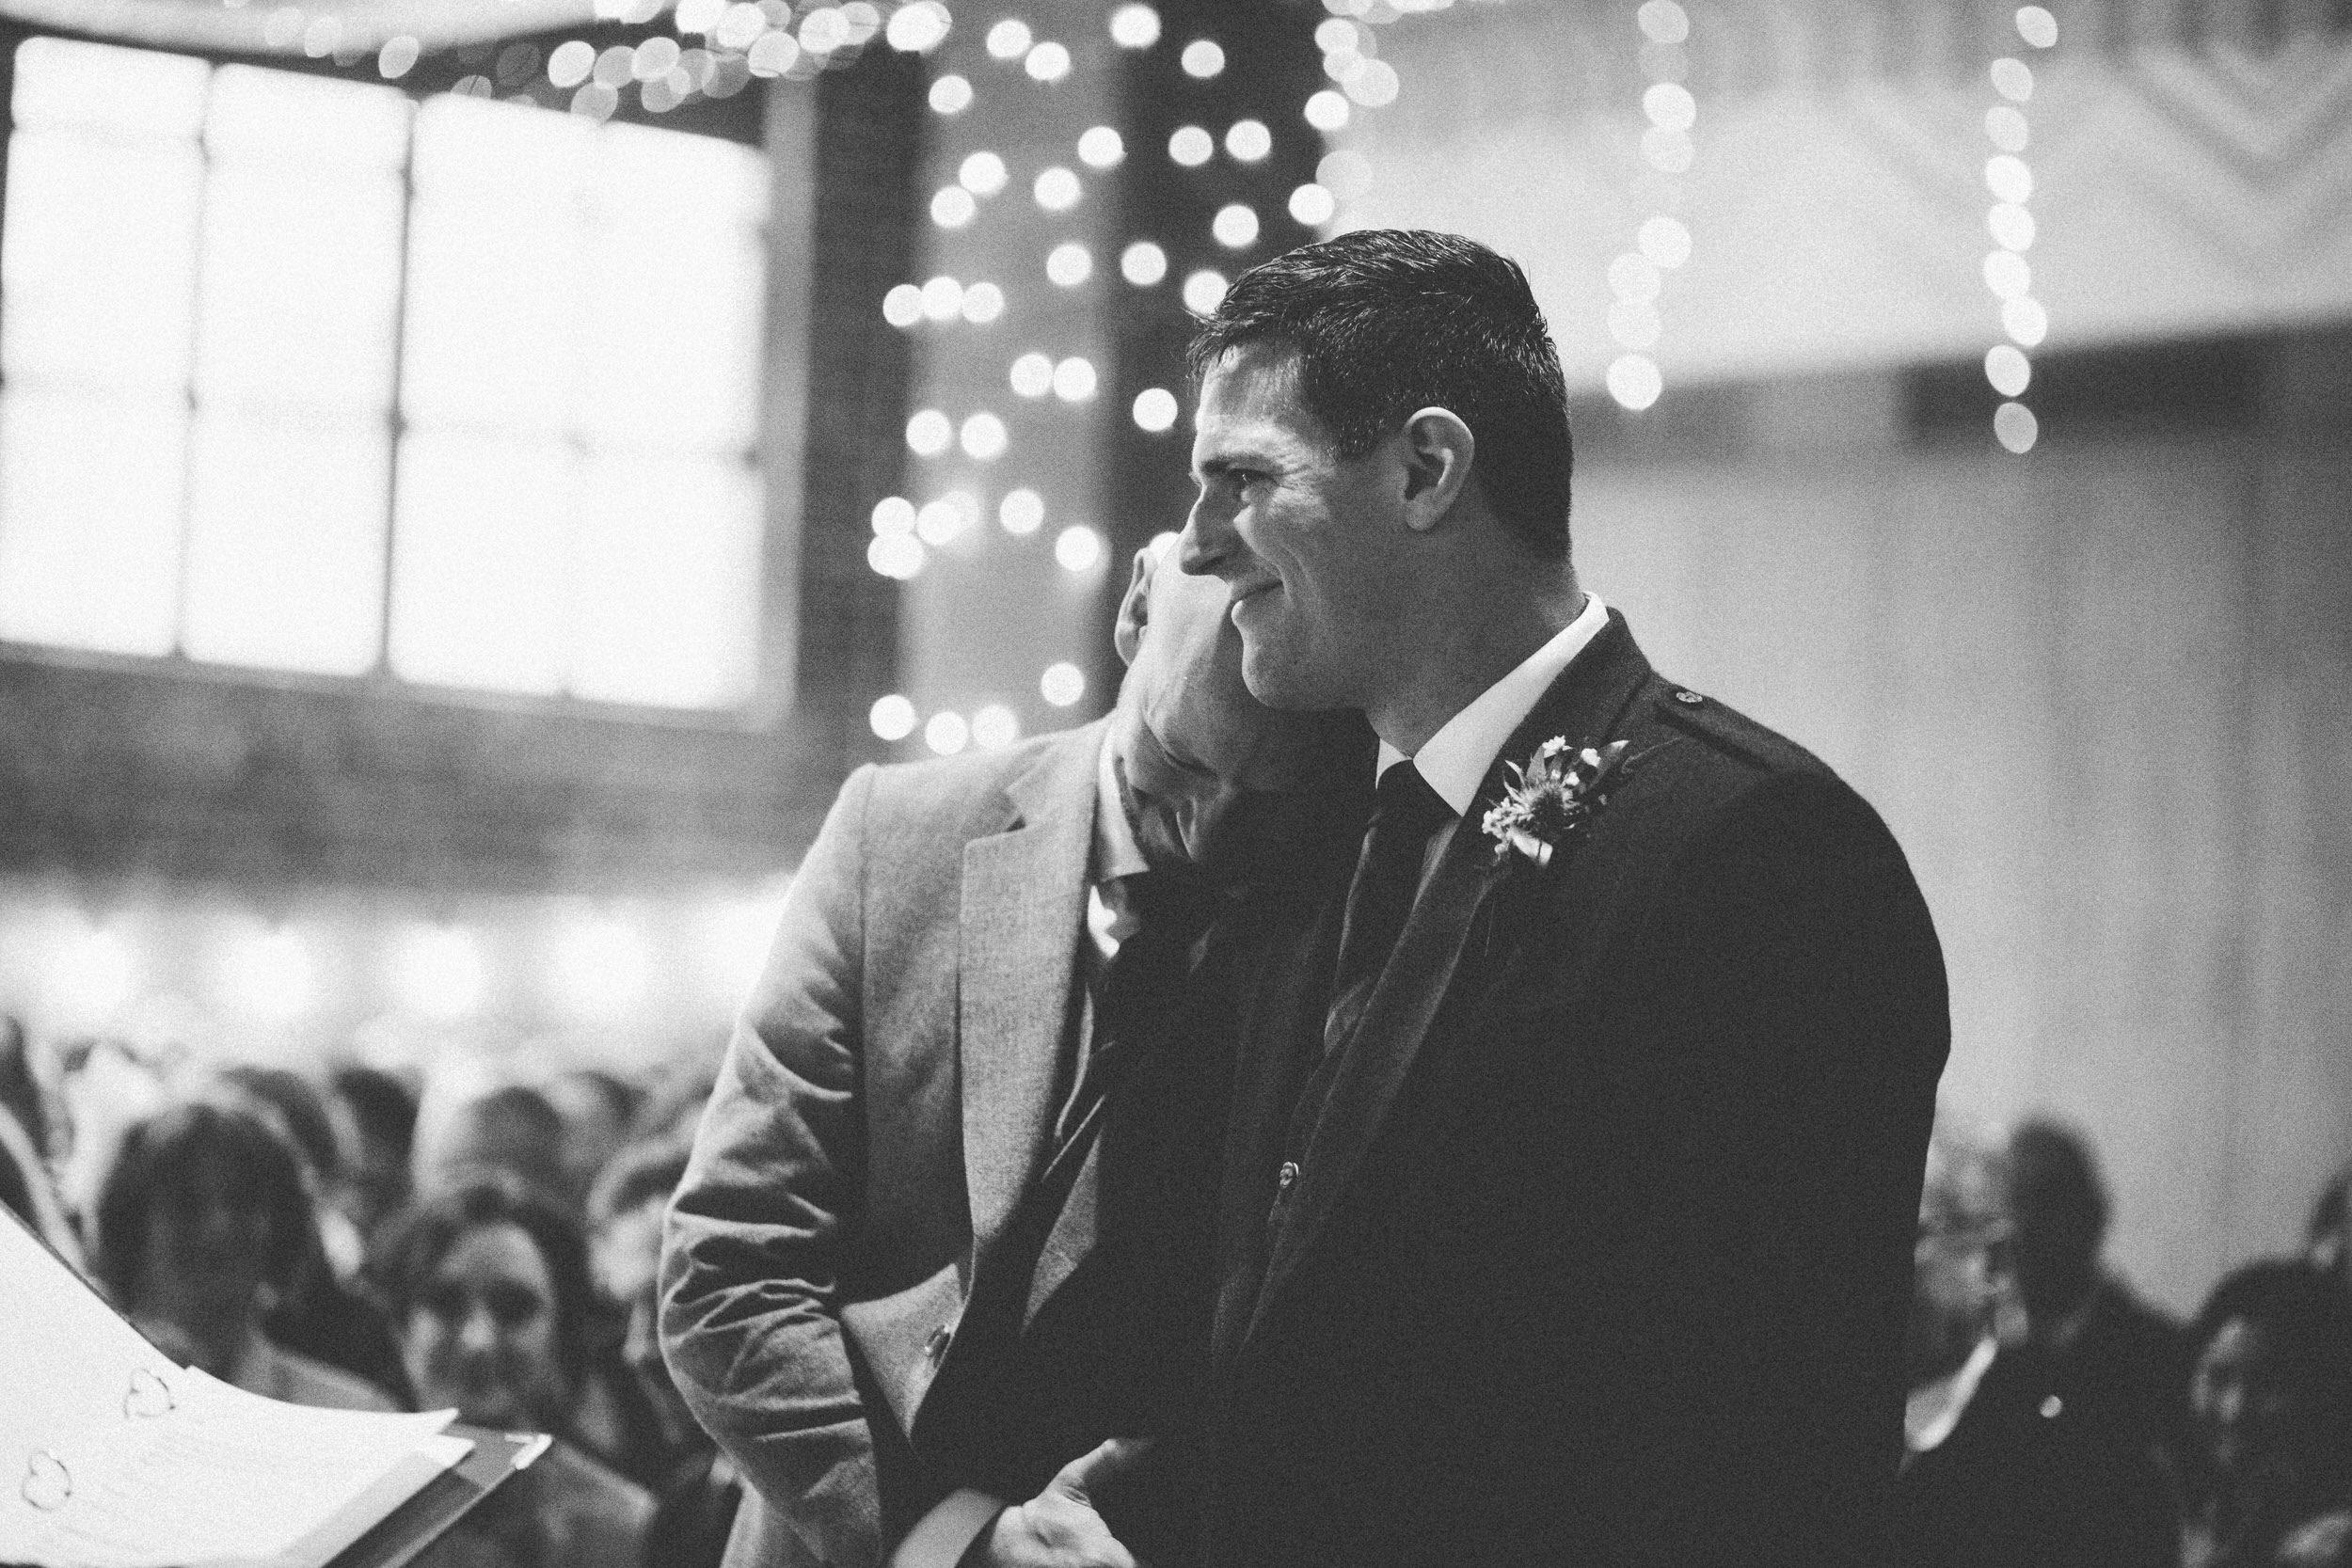 Quirky Wedding Photographer Scotland Glasgow Edinburgh Mirrorbox 068.jpg